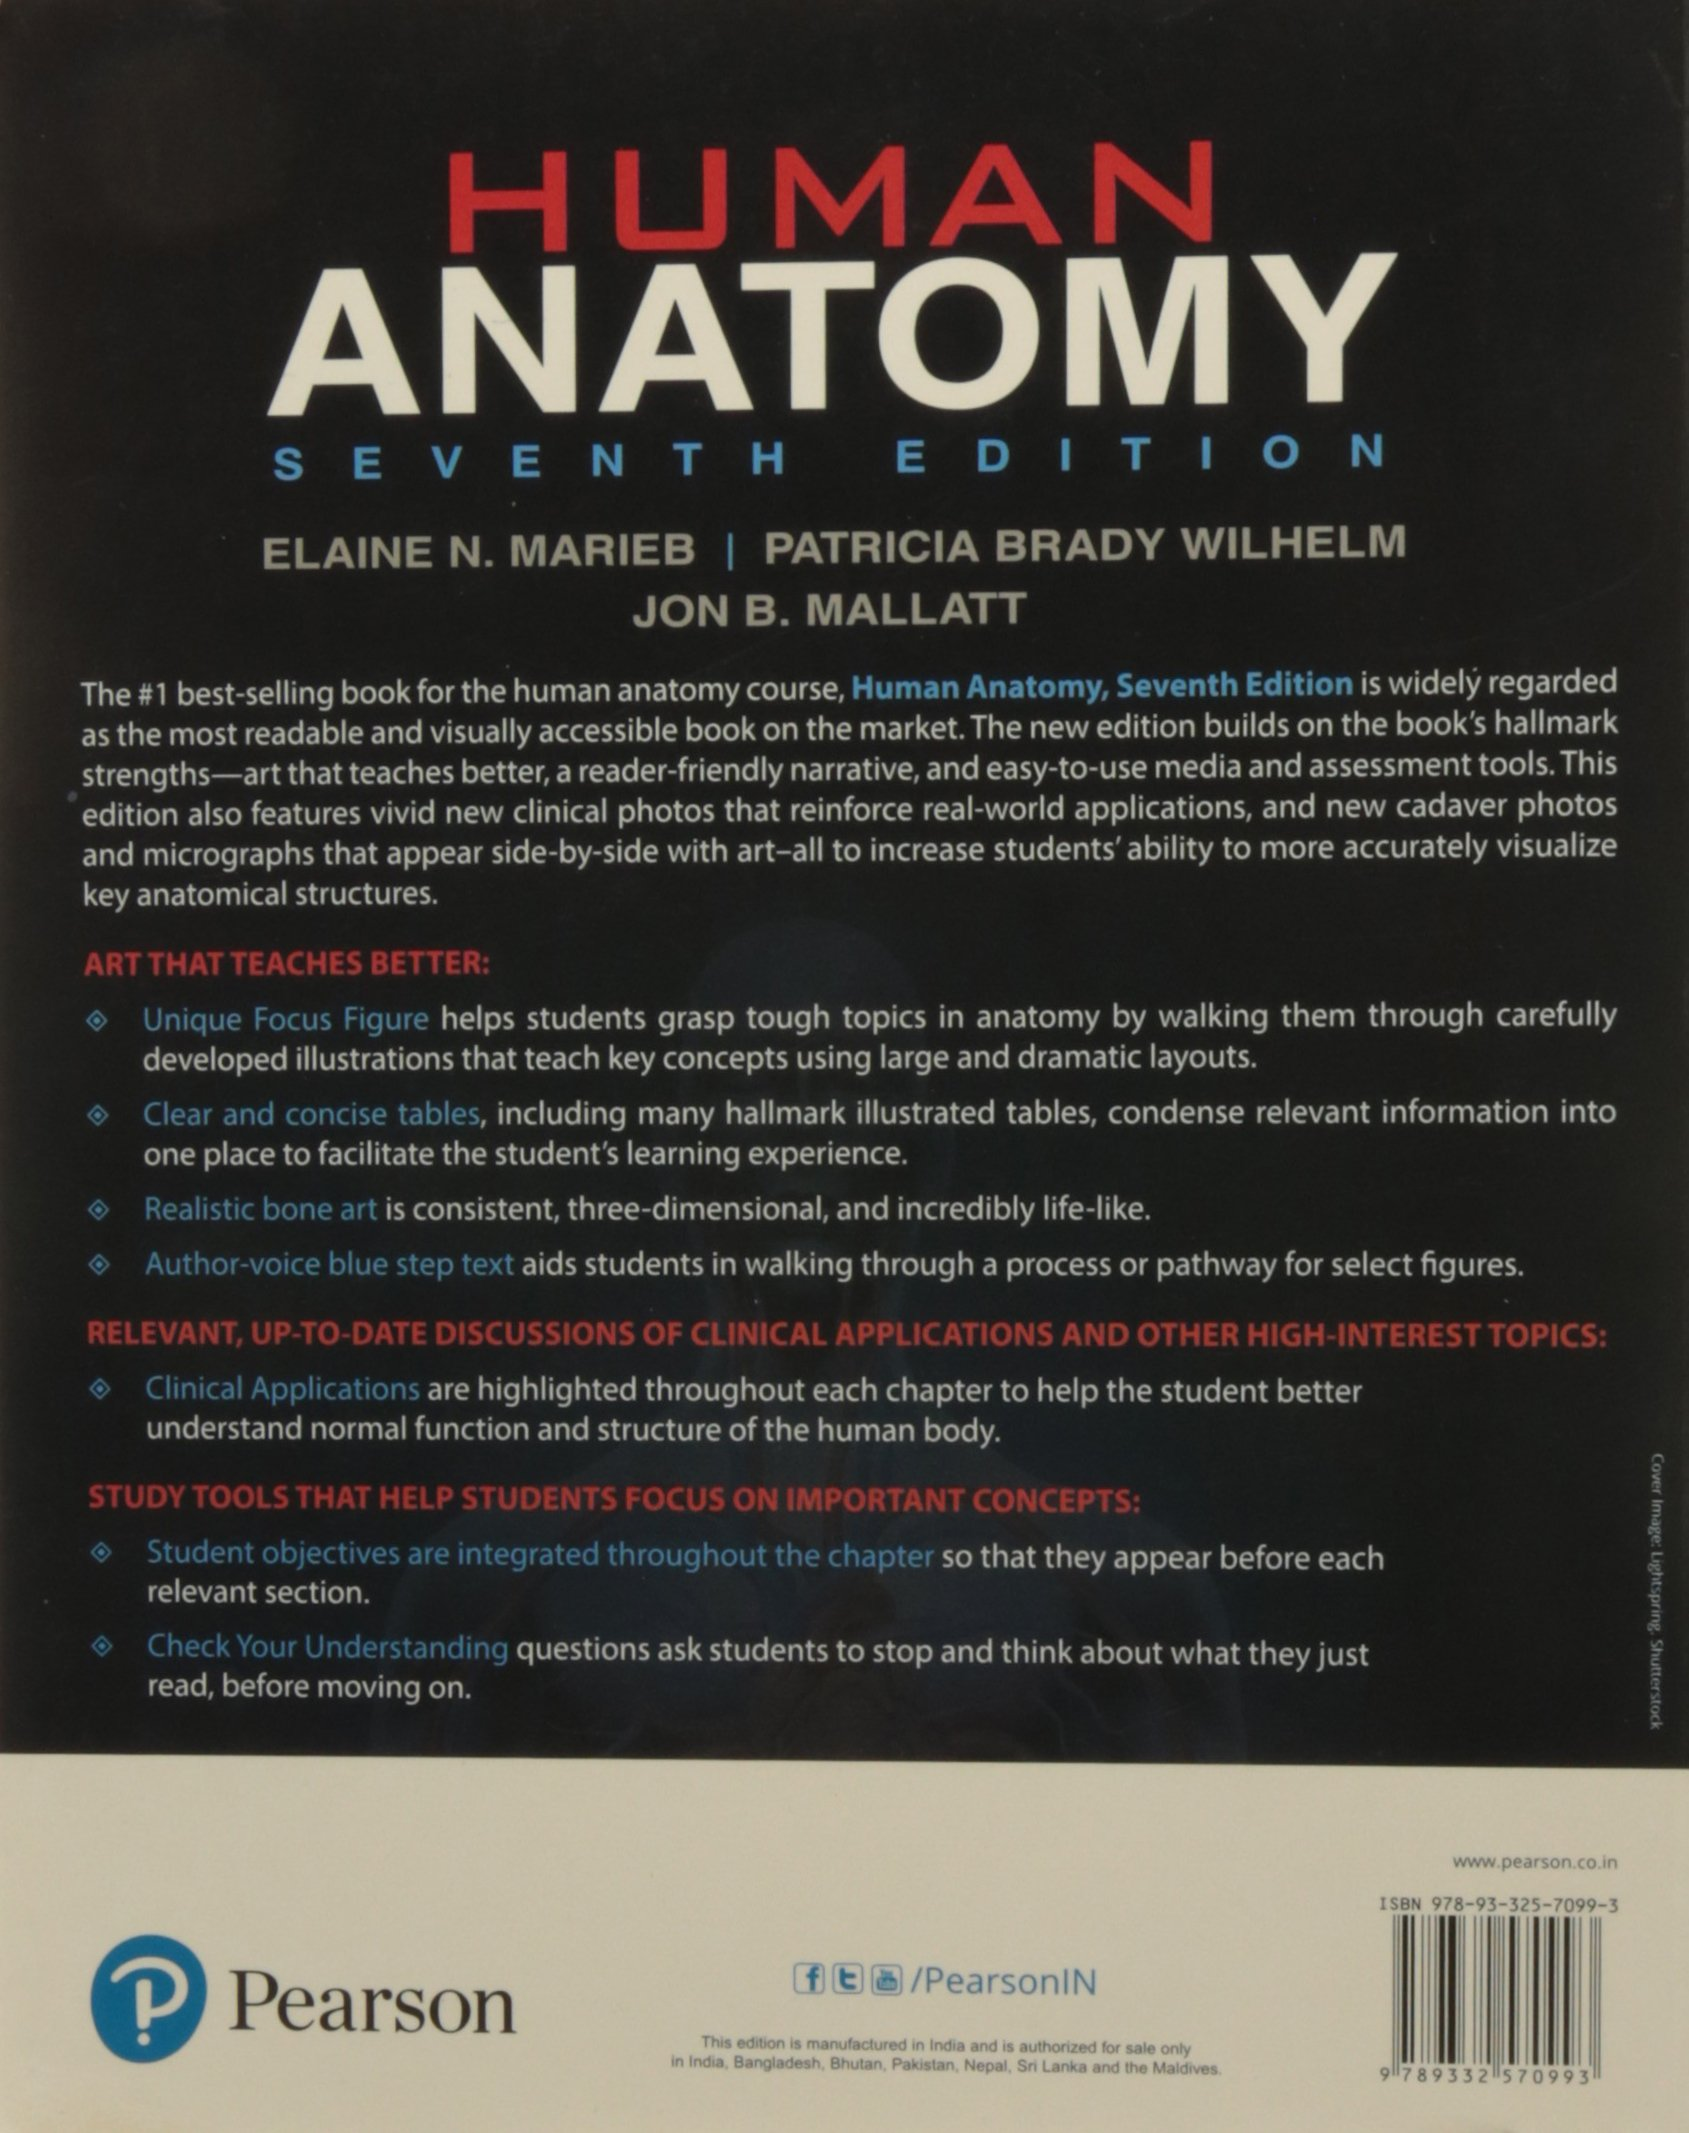 Human Anatomy, 7 Ed: Elaine N Marieb: 9789332570993: Amazon.com: Books